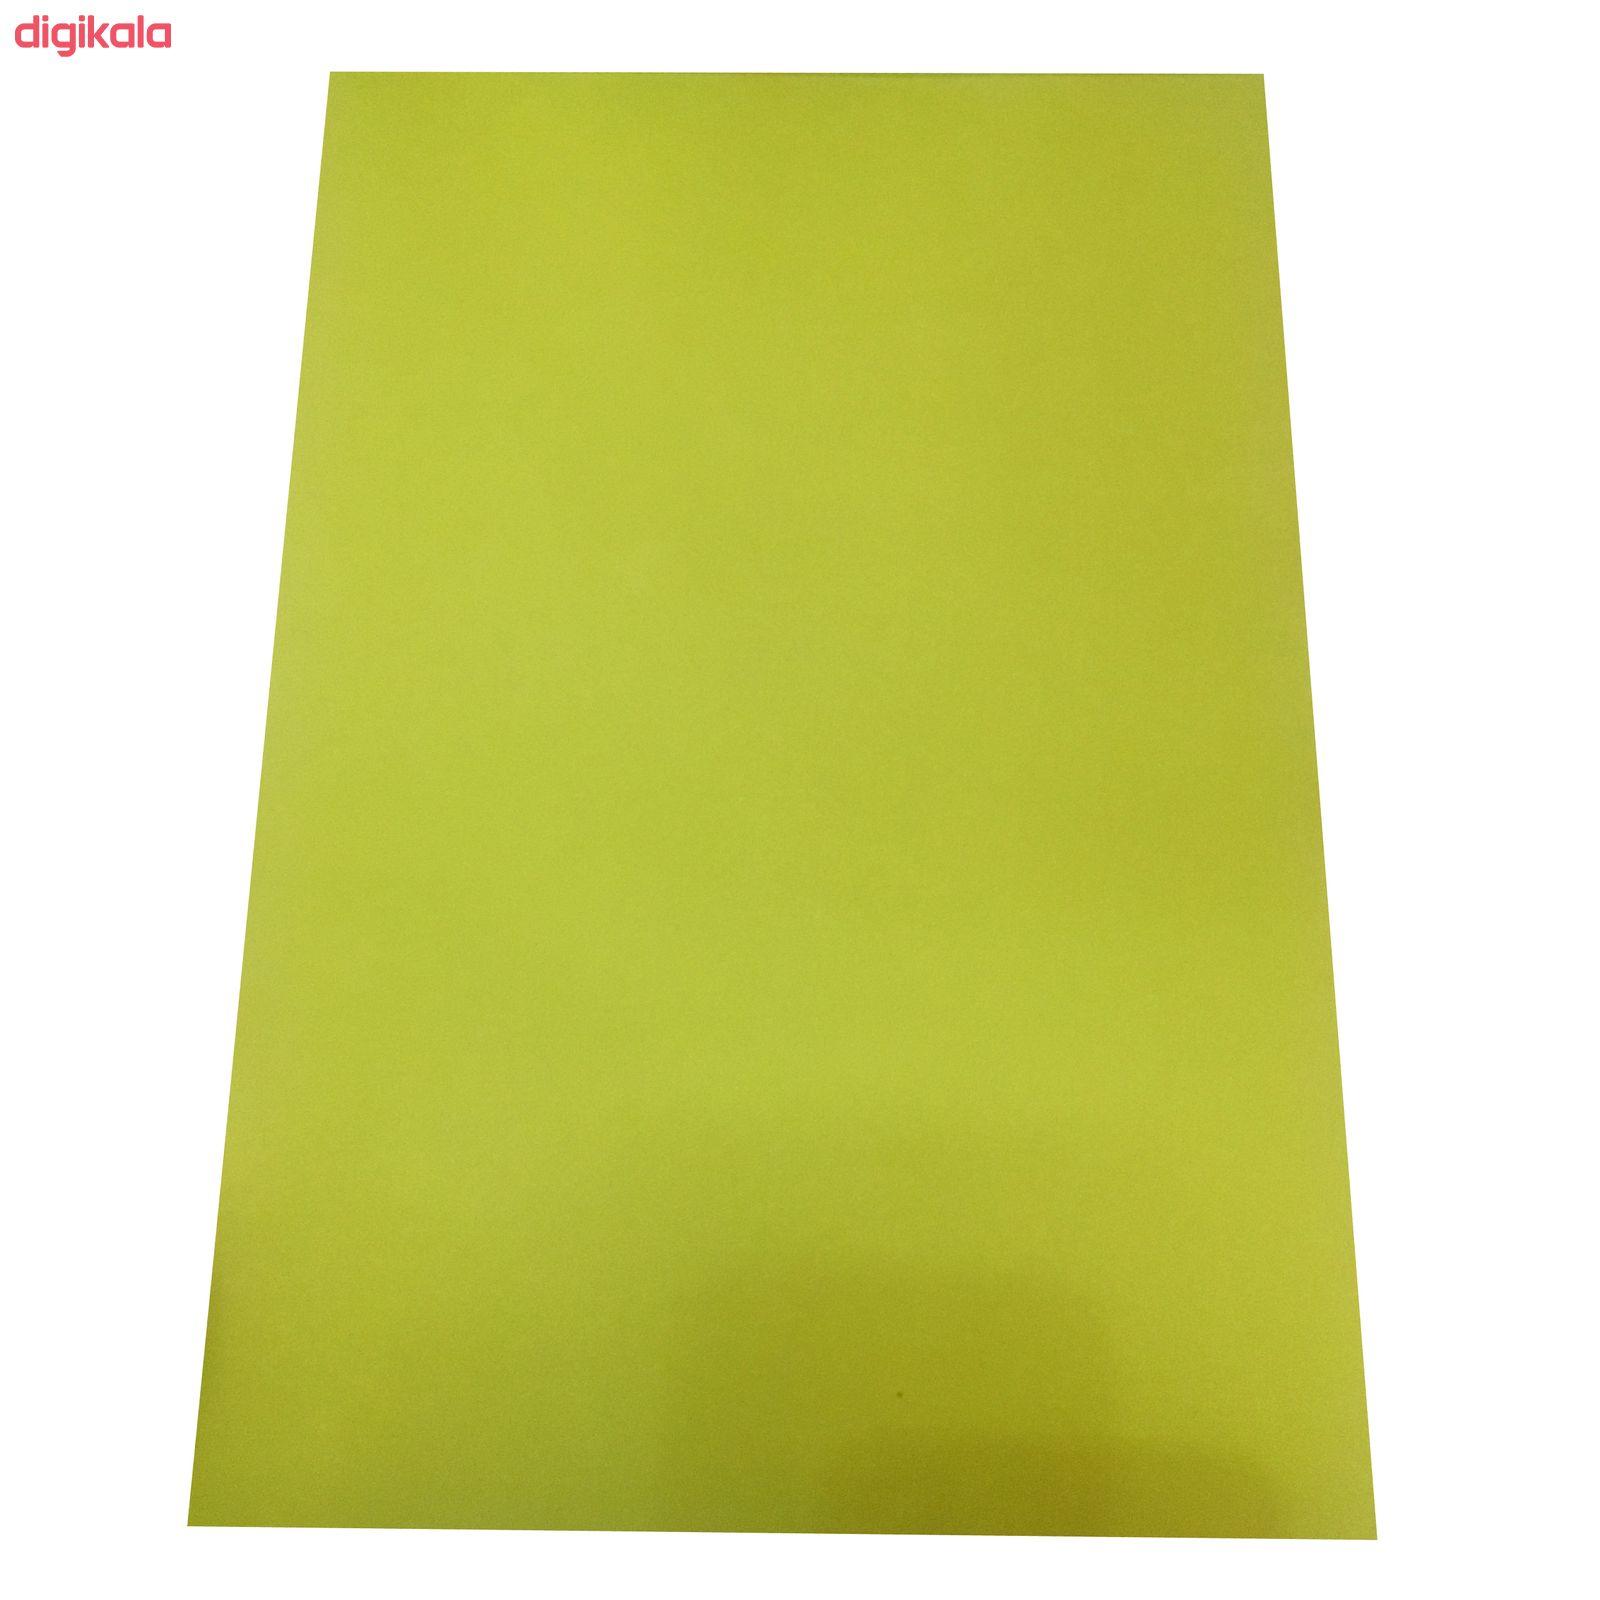 مقوا رنگی کد a-n1904 سایز A4 بسته 10 عددی main 1 1